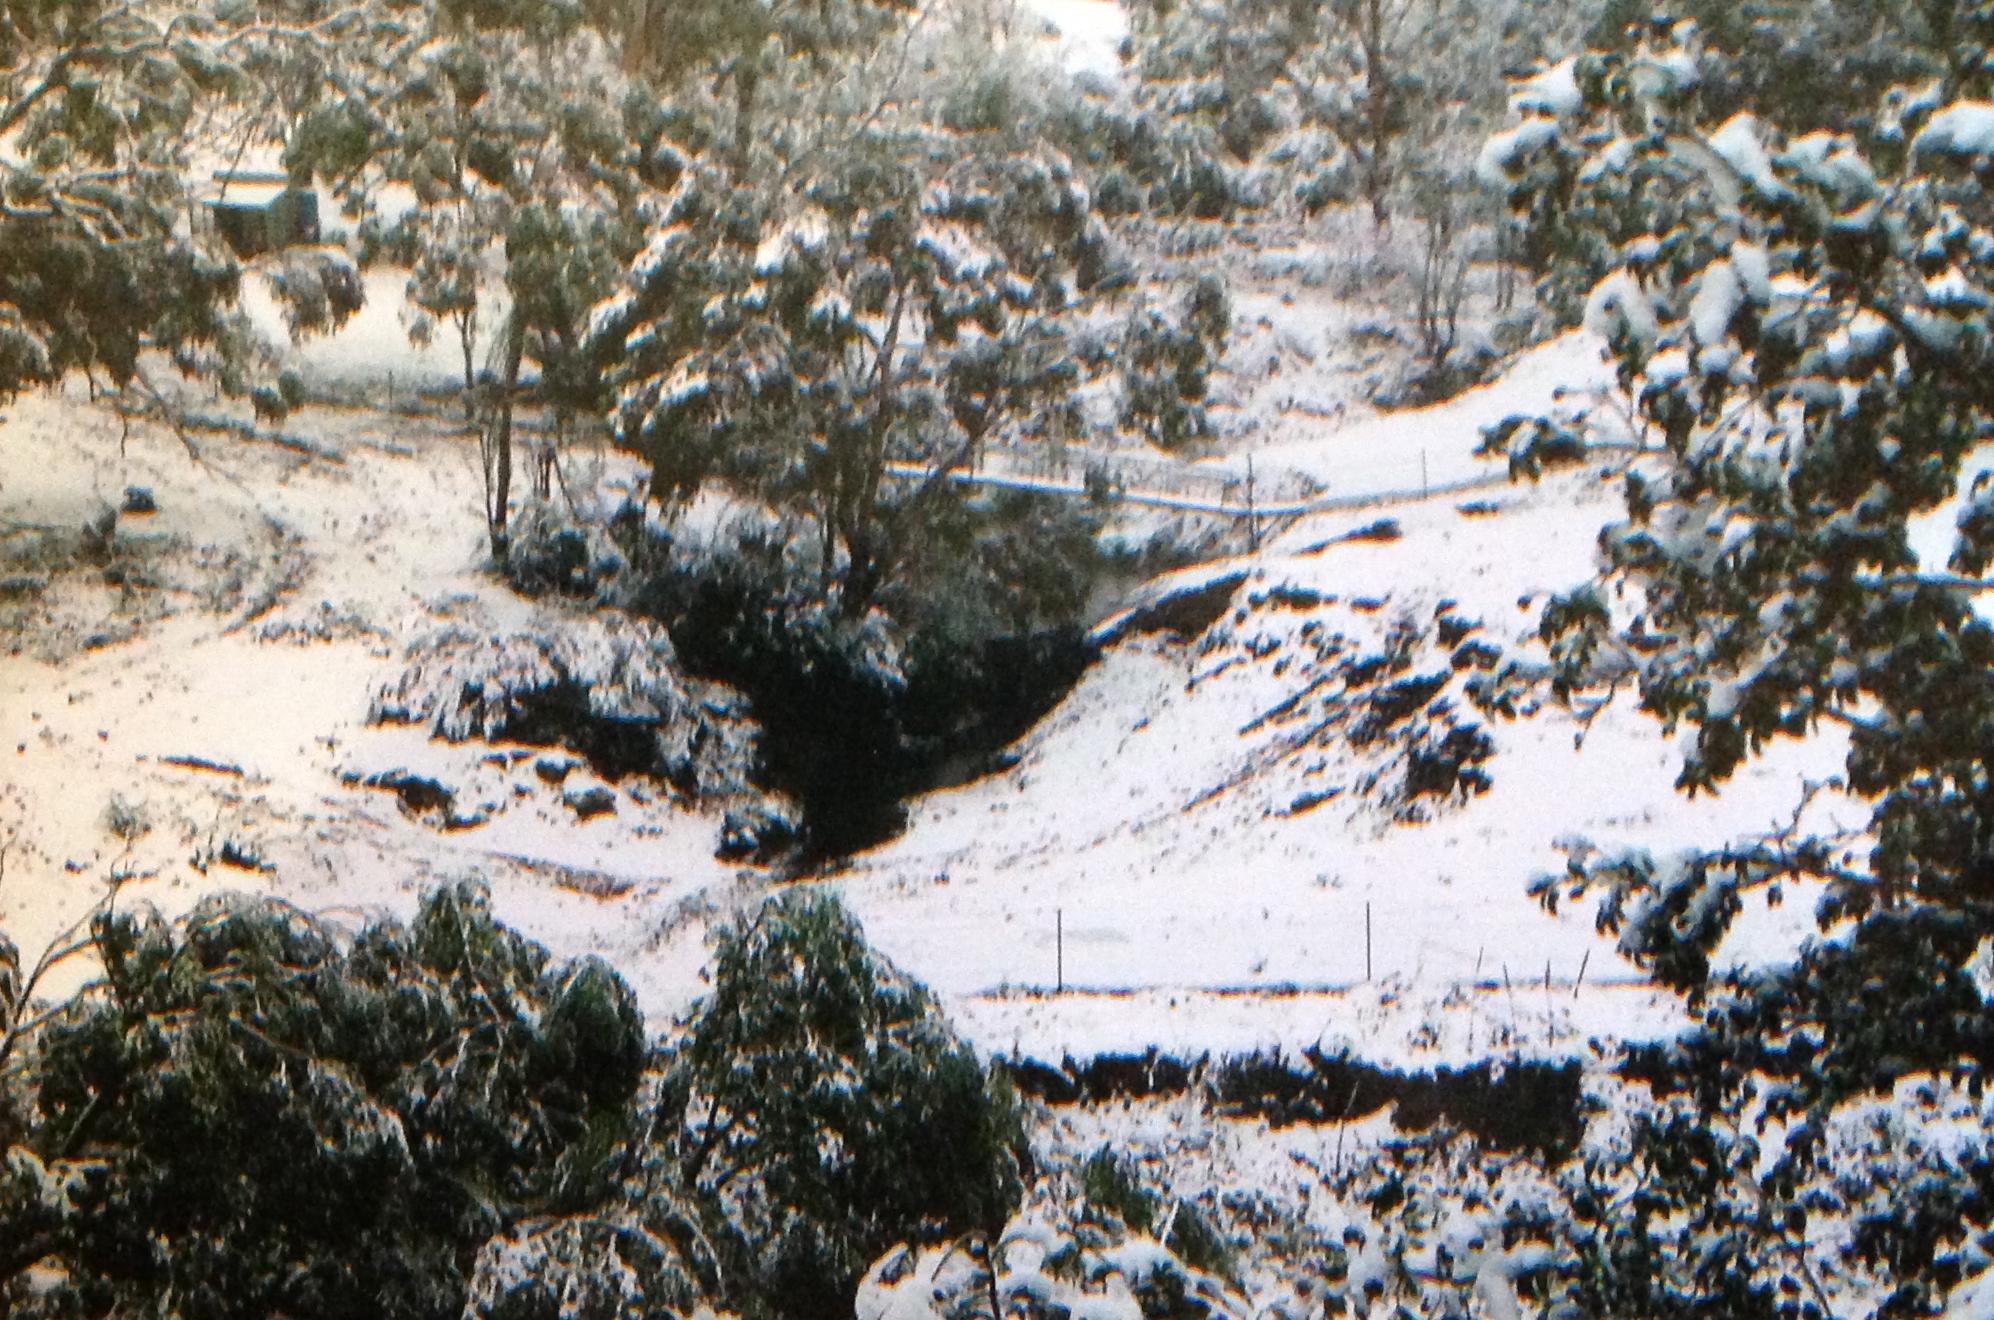 View from Back Verandah Snowing